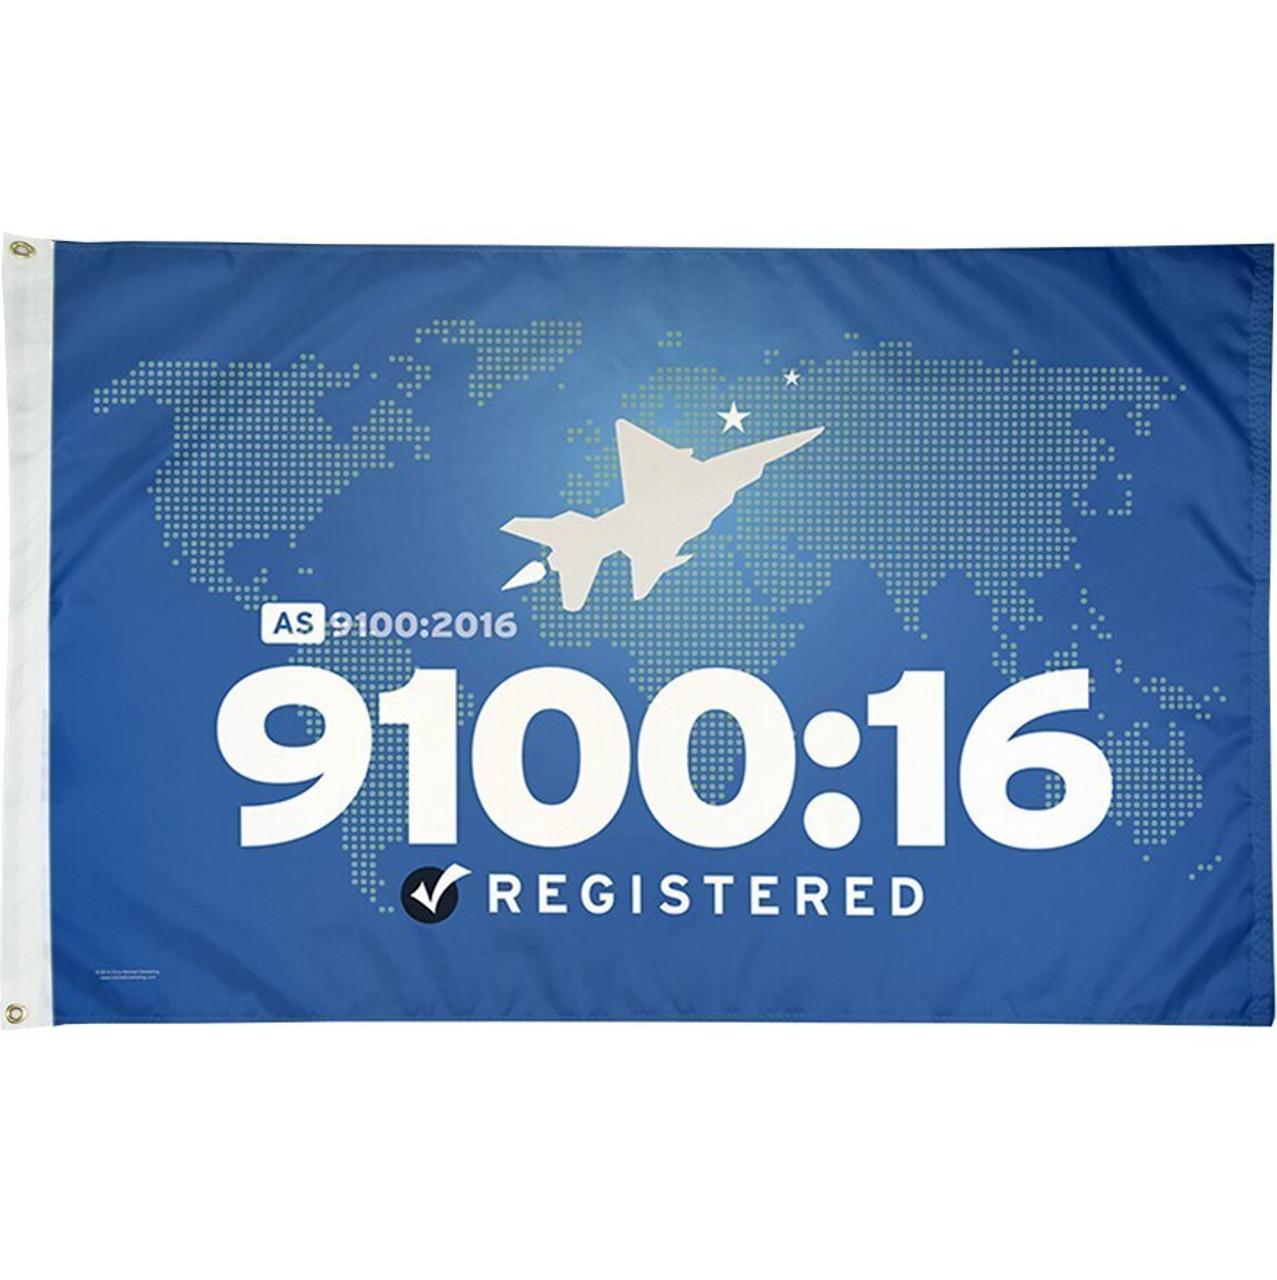 AS 910016 Flag